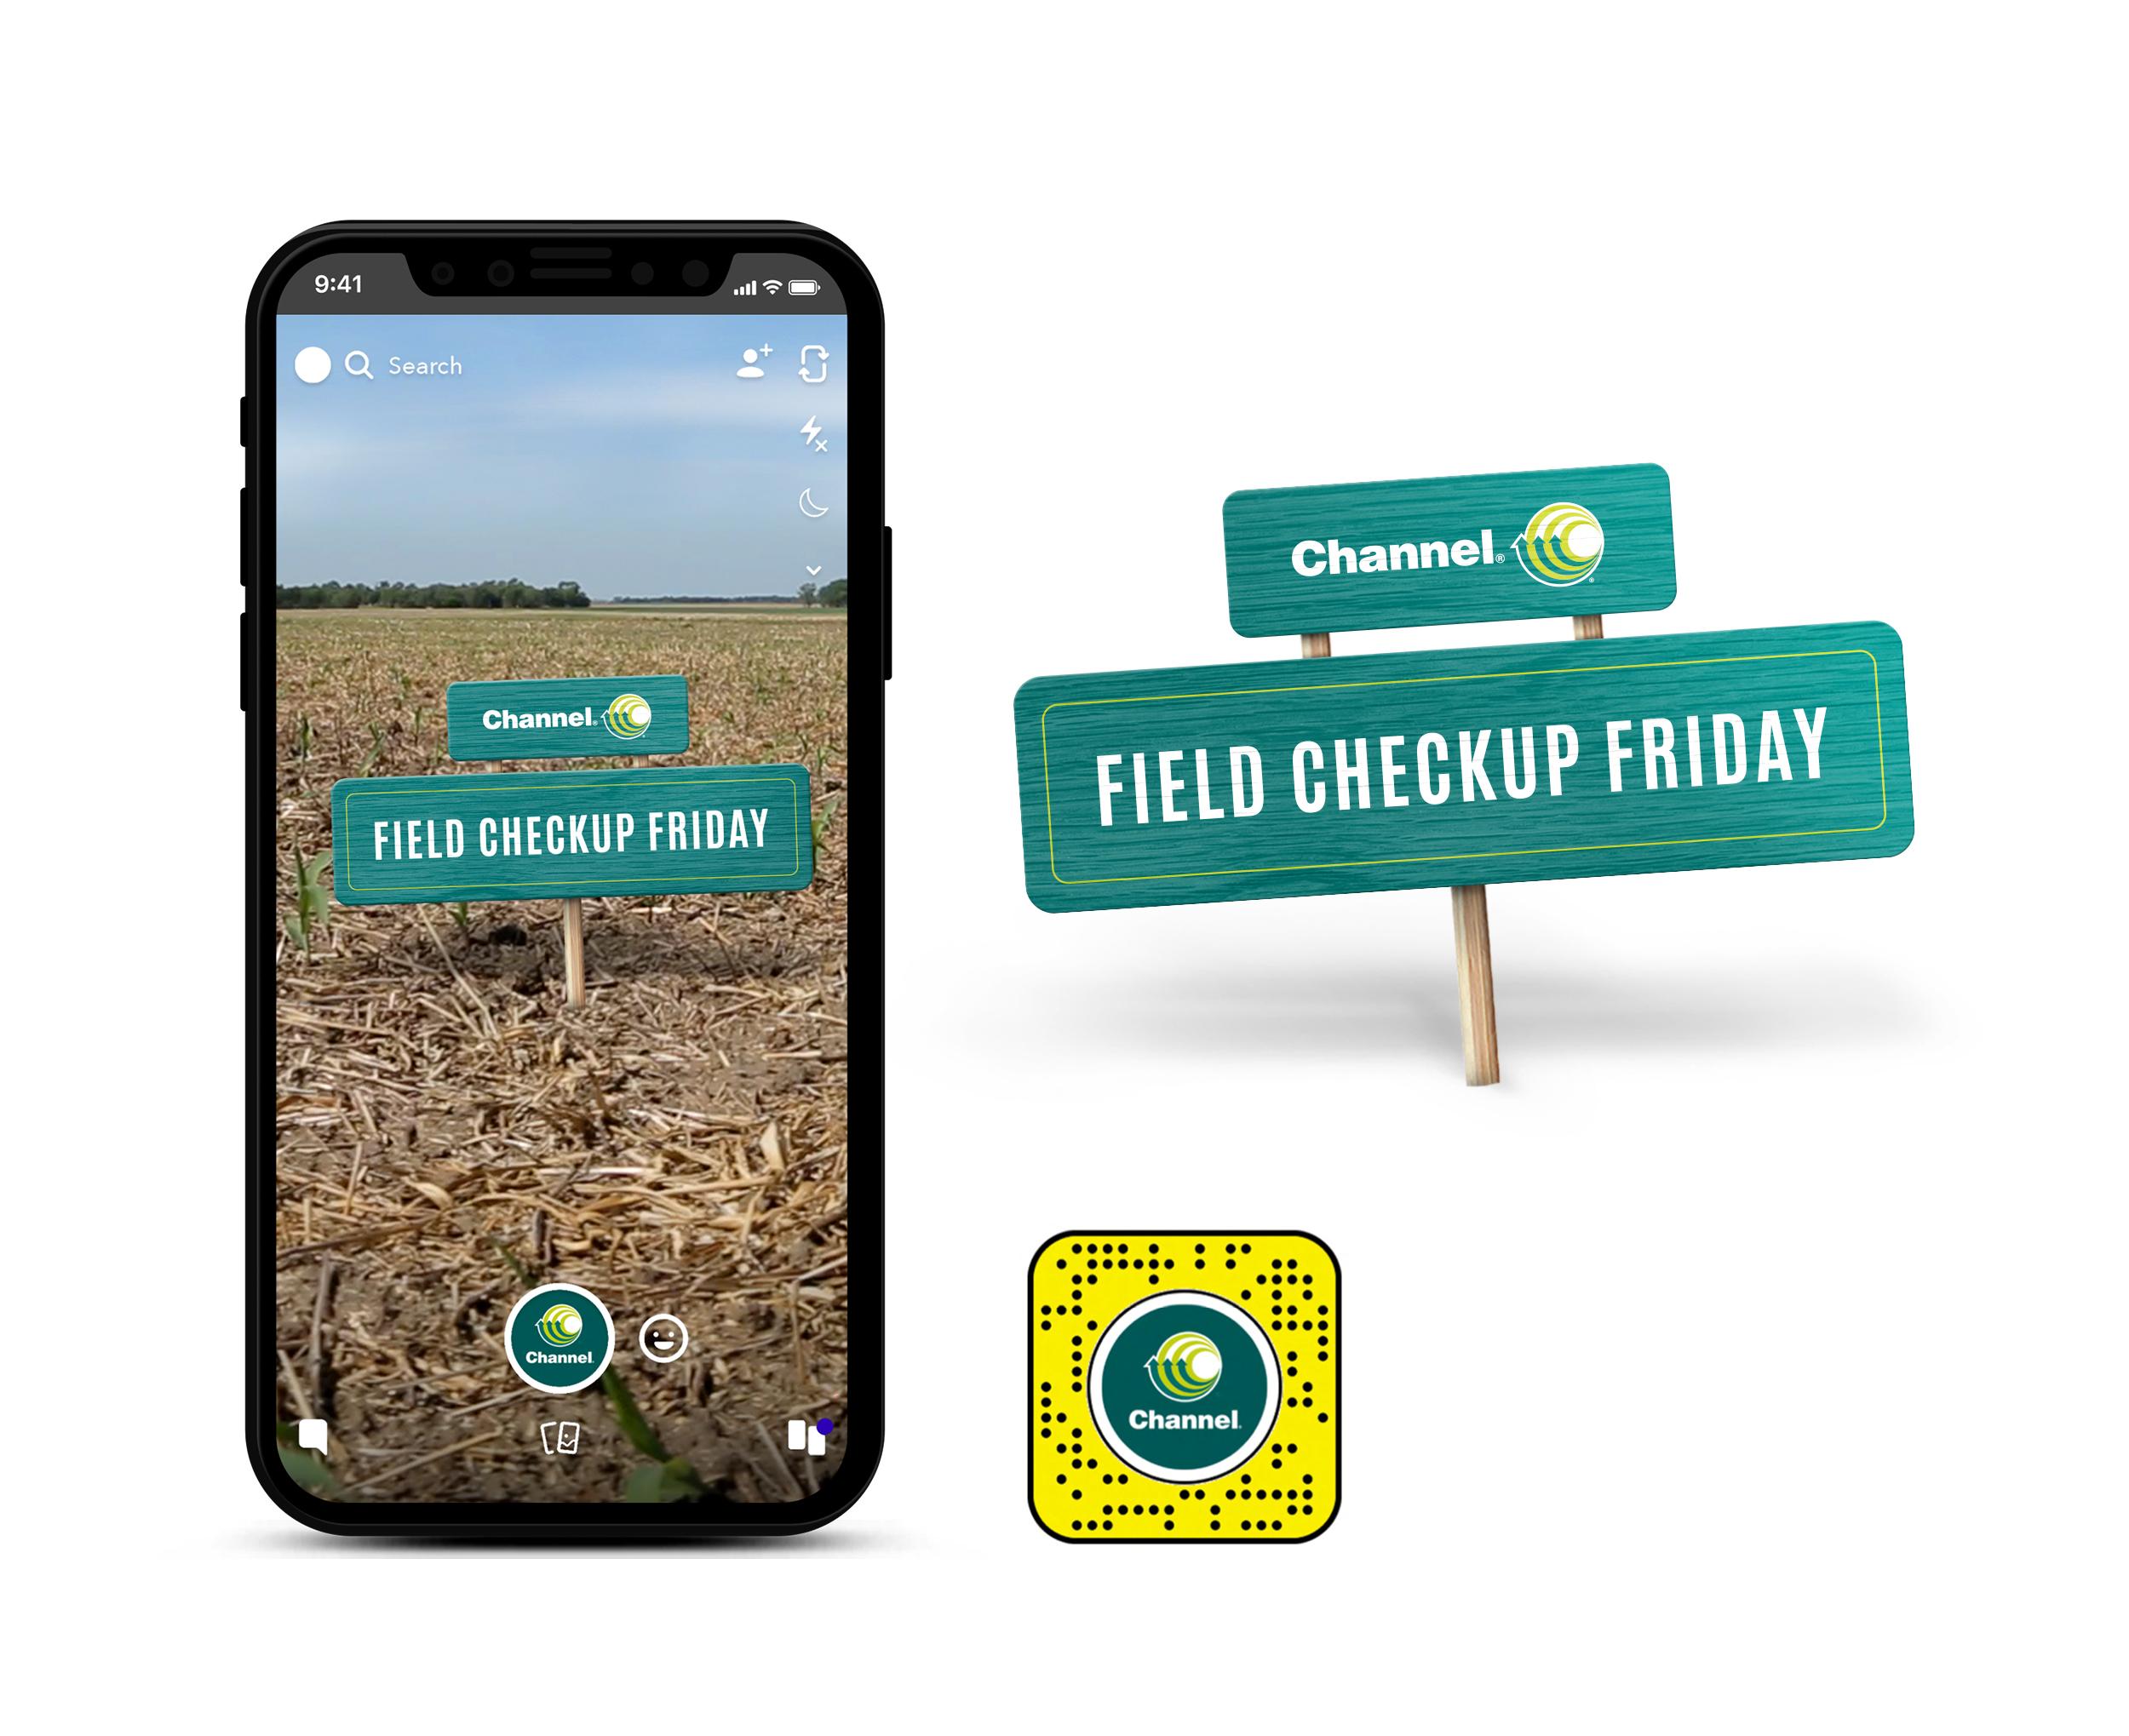 #FieldCheckUpFriday Feed